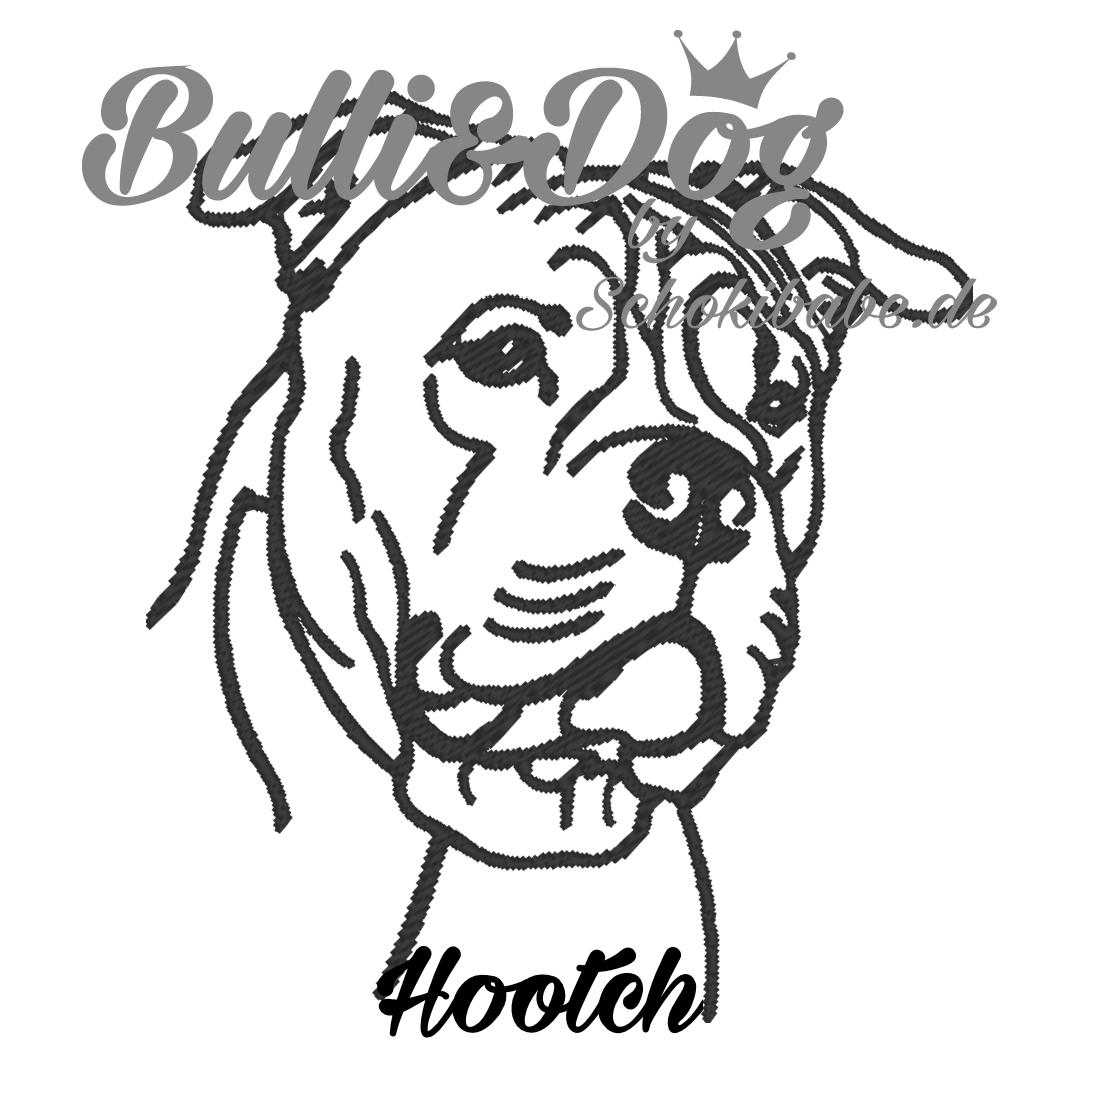 Hootch_7x7-8-Kopie5b5c22d2212cc